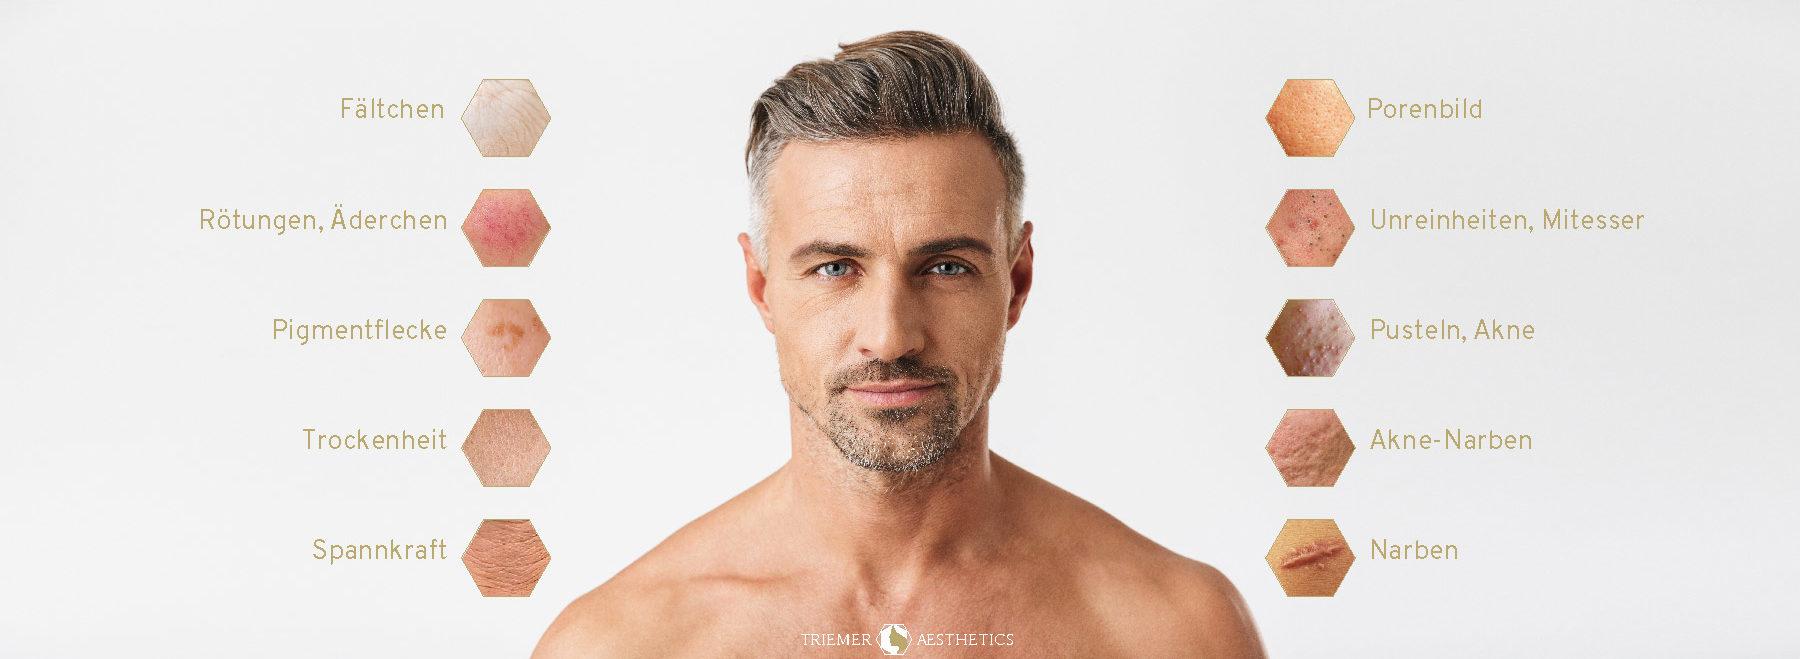 Triemer Aeshetics Dresden Ästhetik Kosmetik Medizin Schönheit Schönheitsmedizin Haut Hautqualität Mann Männer